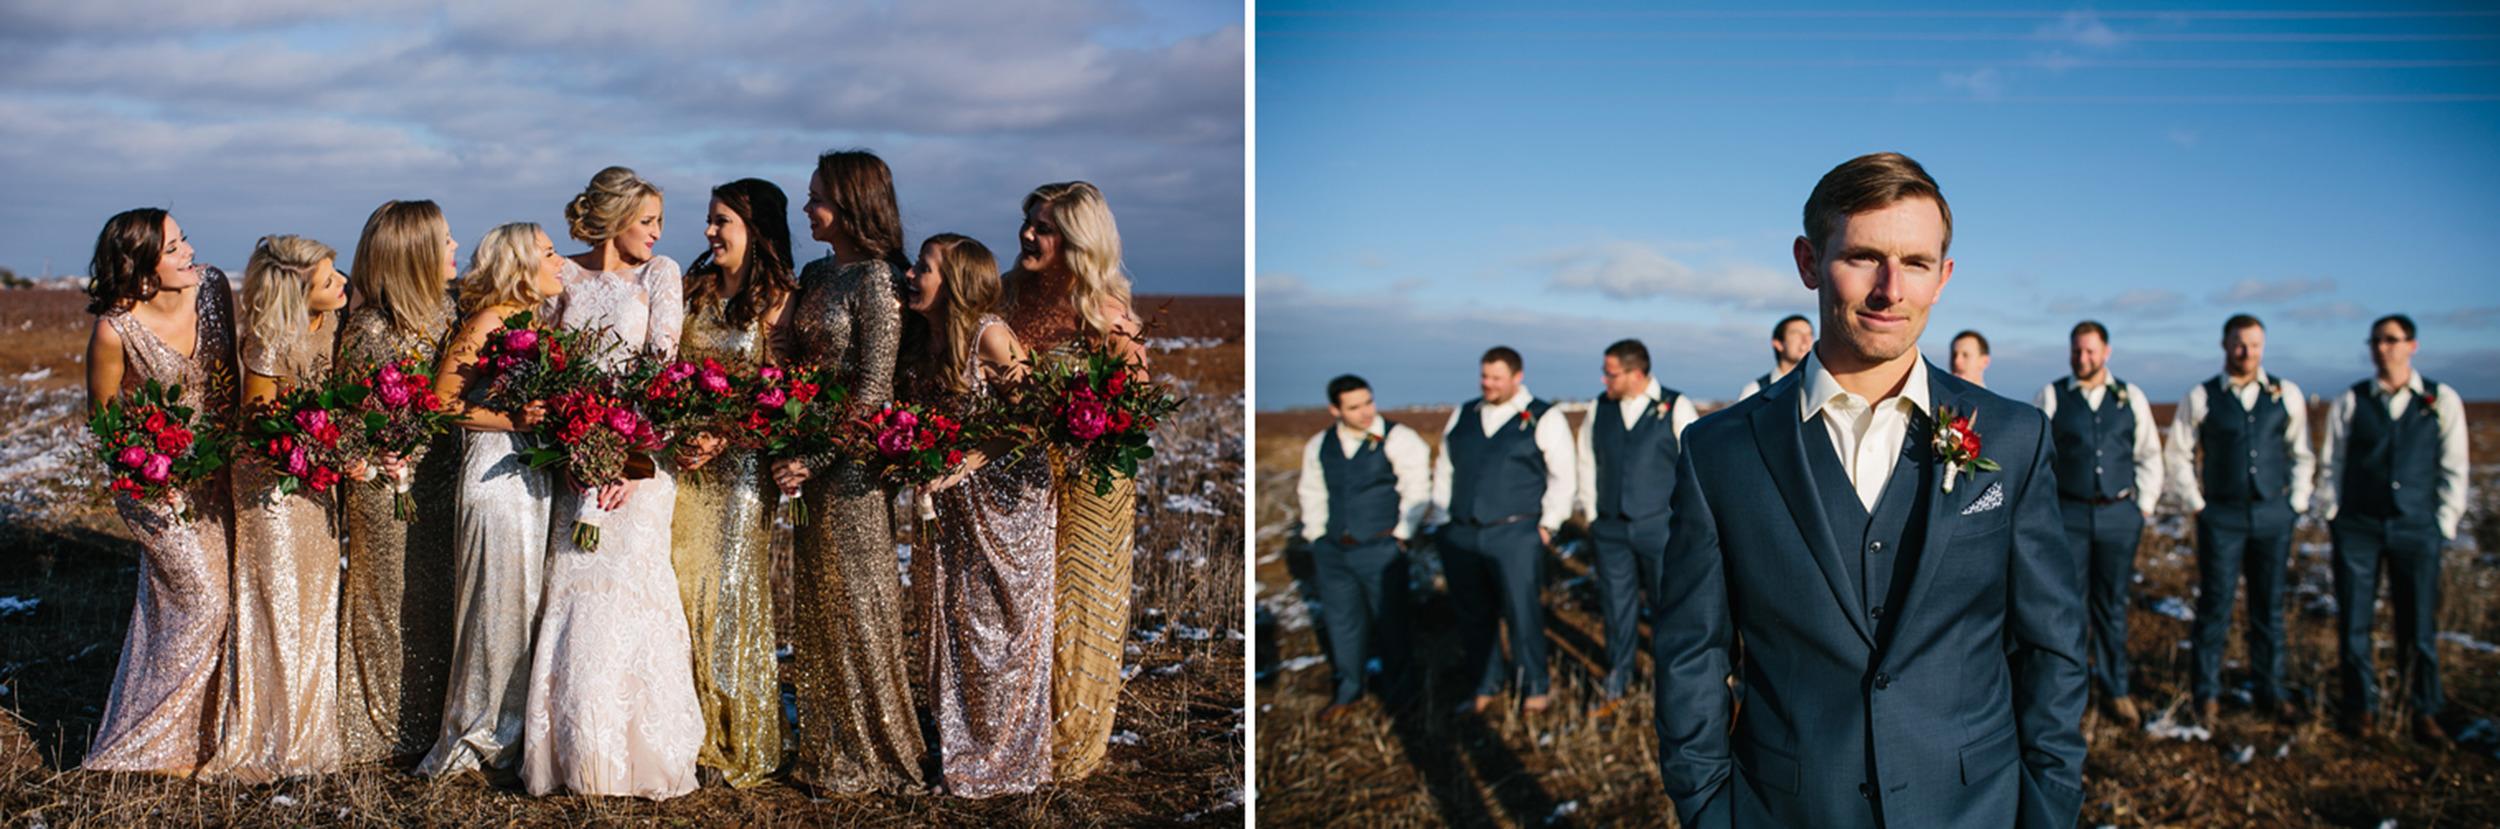 Cotton_Creek_Barn_Winter_Wedding_WeddingPhotographer036.jpg